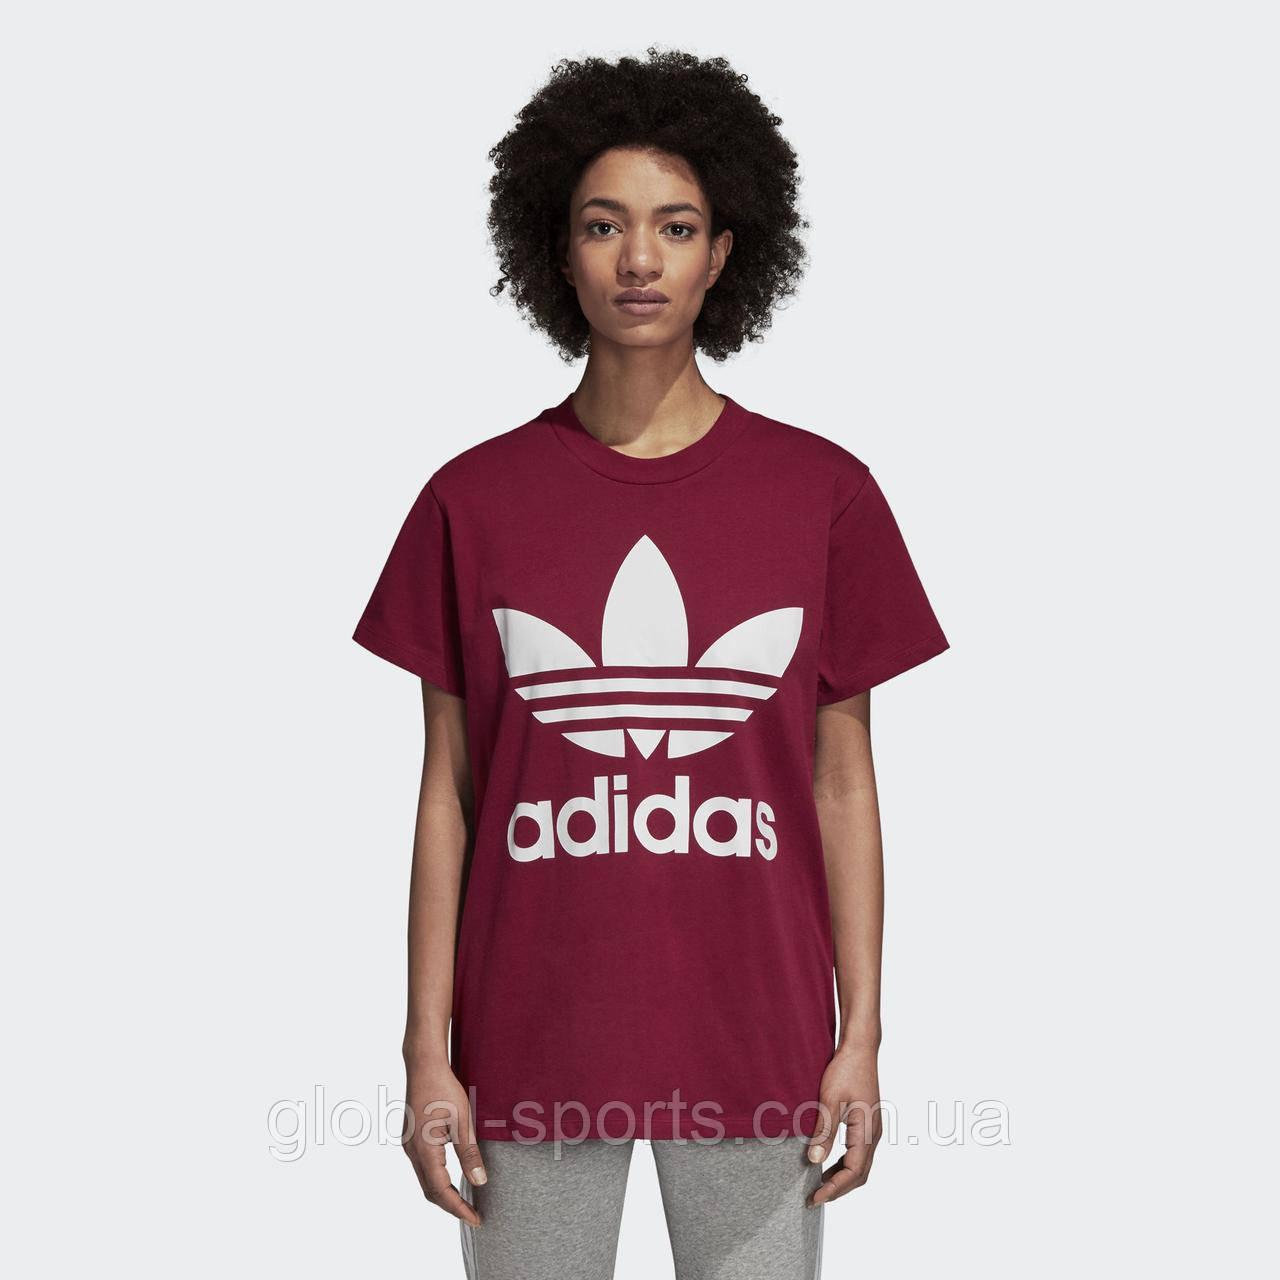 dc6e823b Женская футболка Adidas Originals Trefoil Oversize (Артикул: DH4430 ...